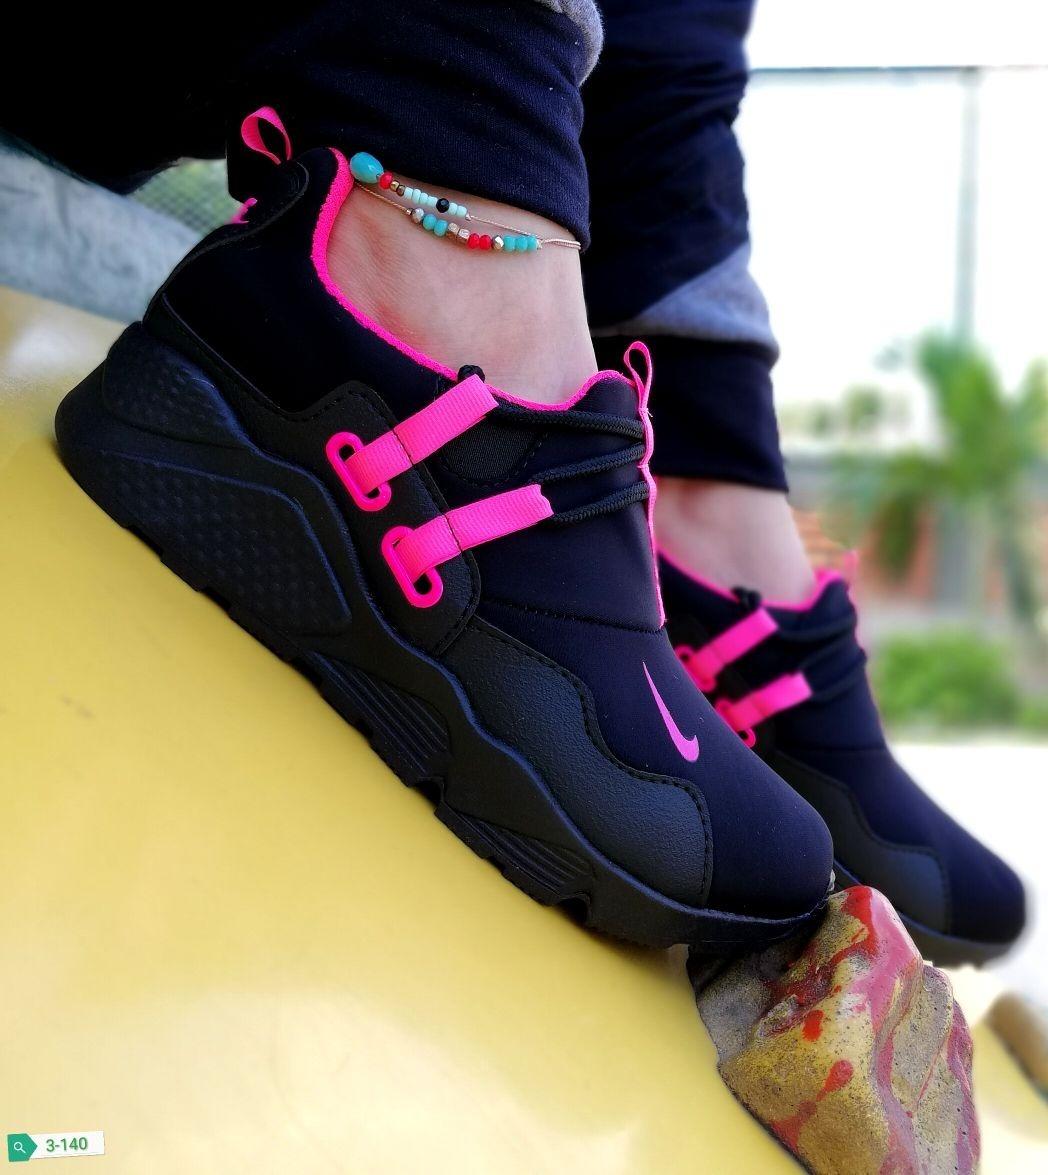 515d62479251b Calzado Deportivo Nike Dama